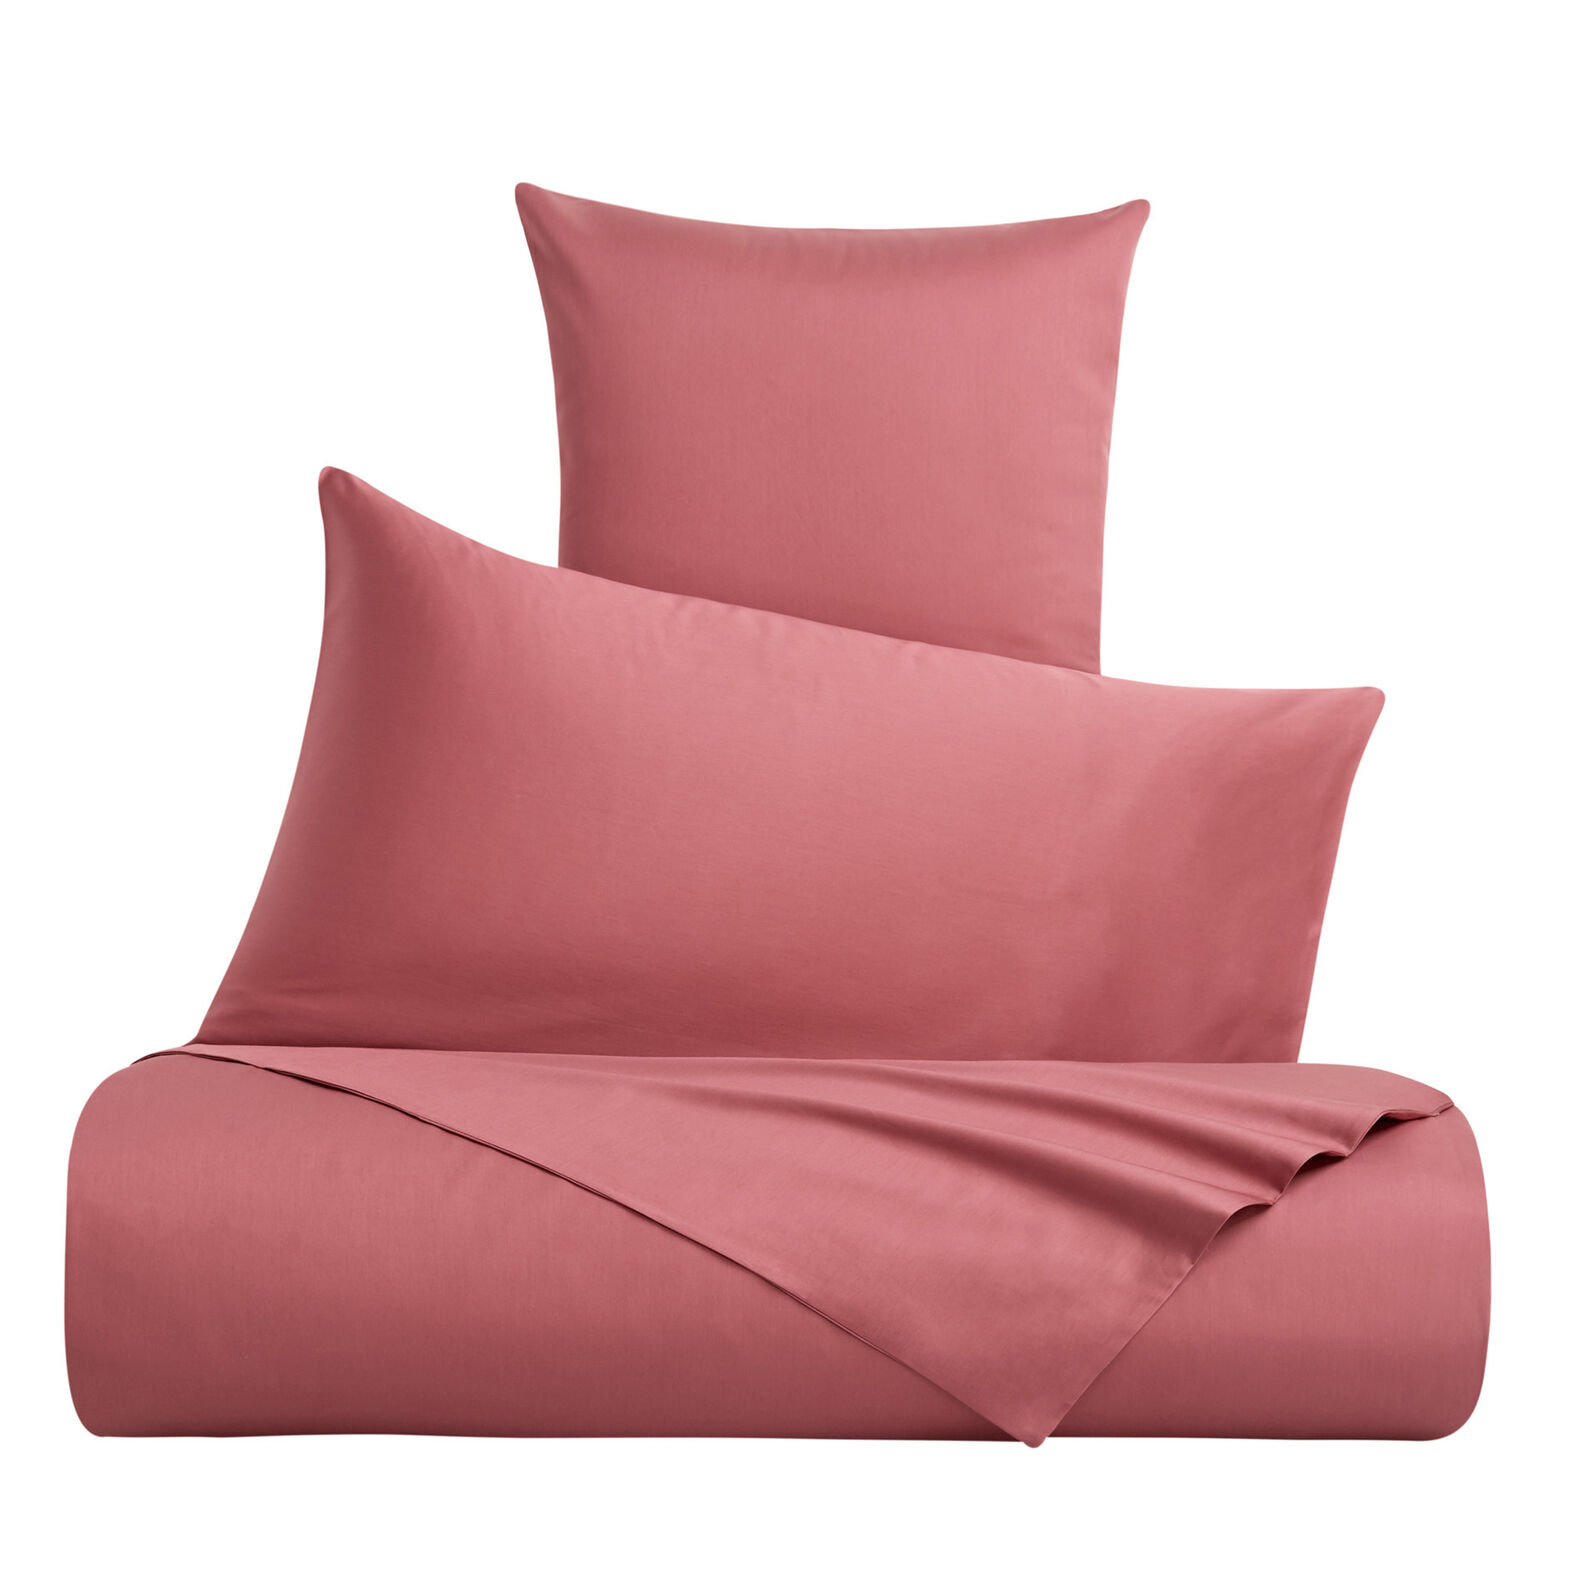 Zefiro pure cotton satin bed parure